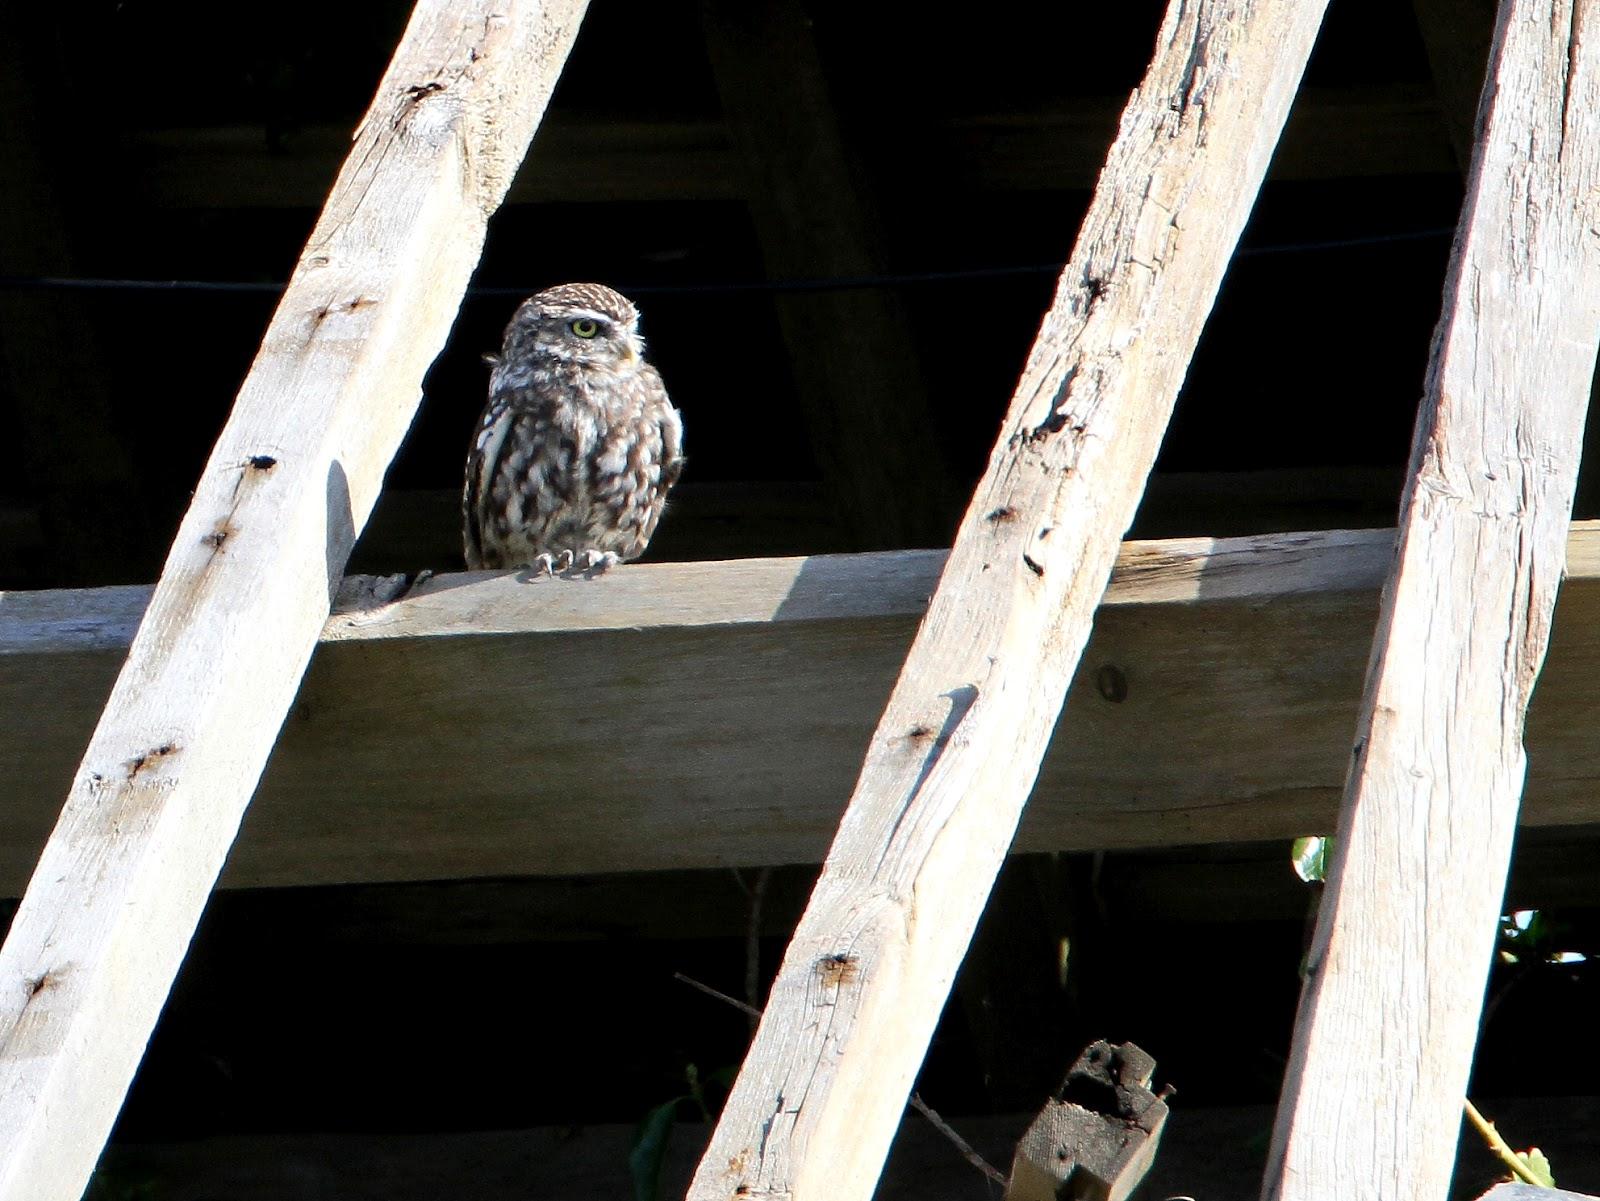 Birders in Boxers: An average day's birdin' until.........